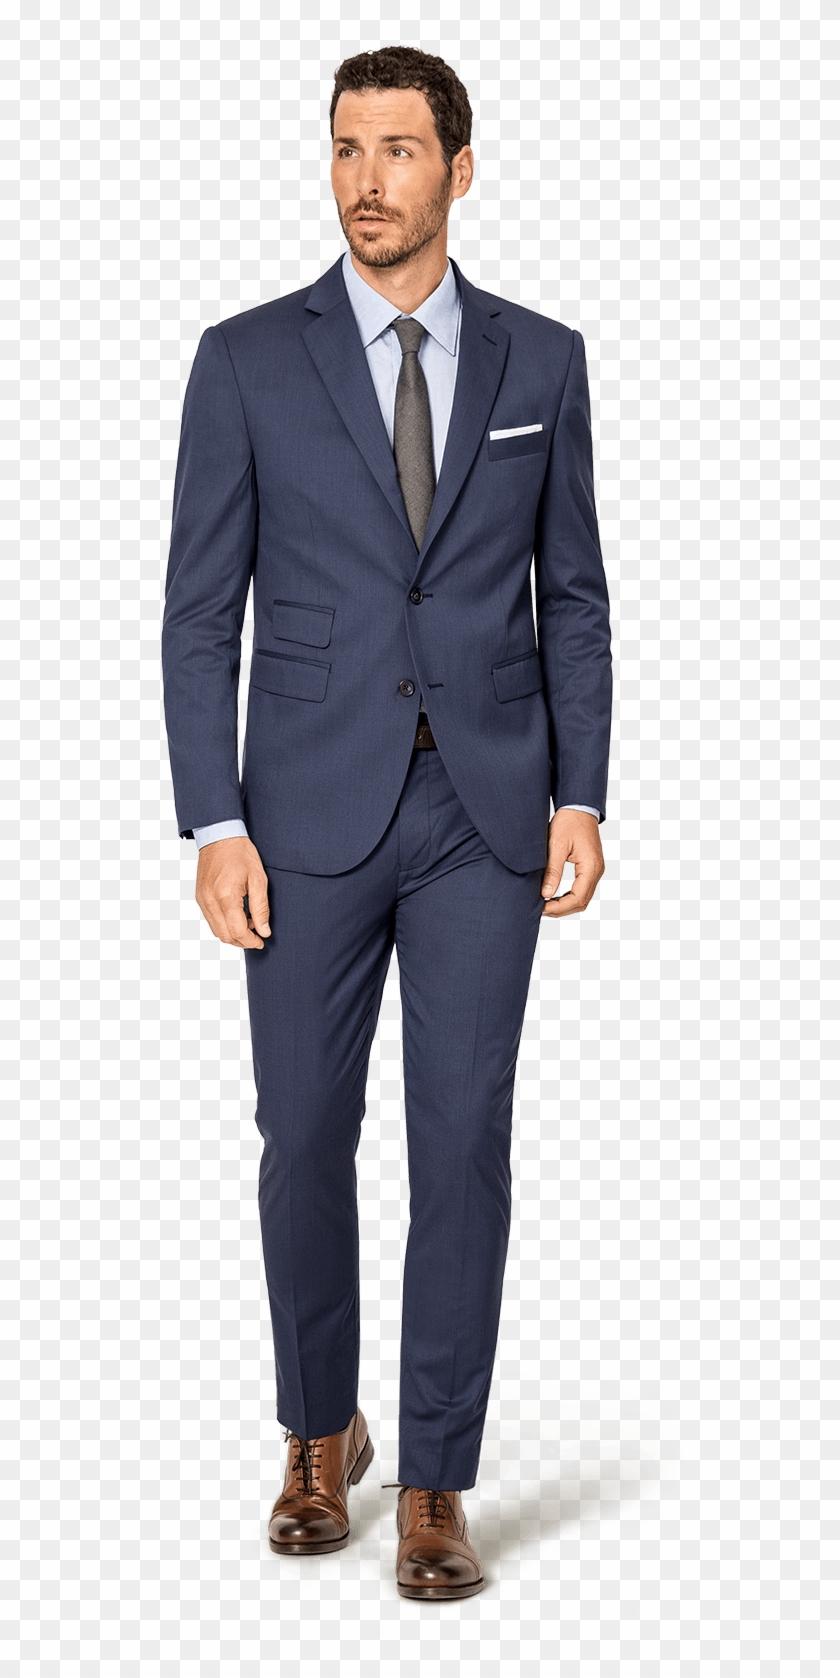 Blue Wool Custom Suit - Traje A Medida Hombre, HD Png ... clip art library download